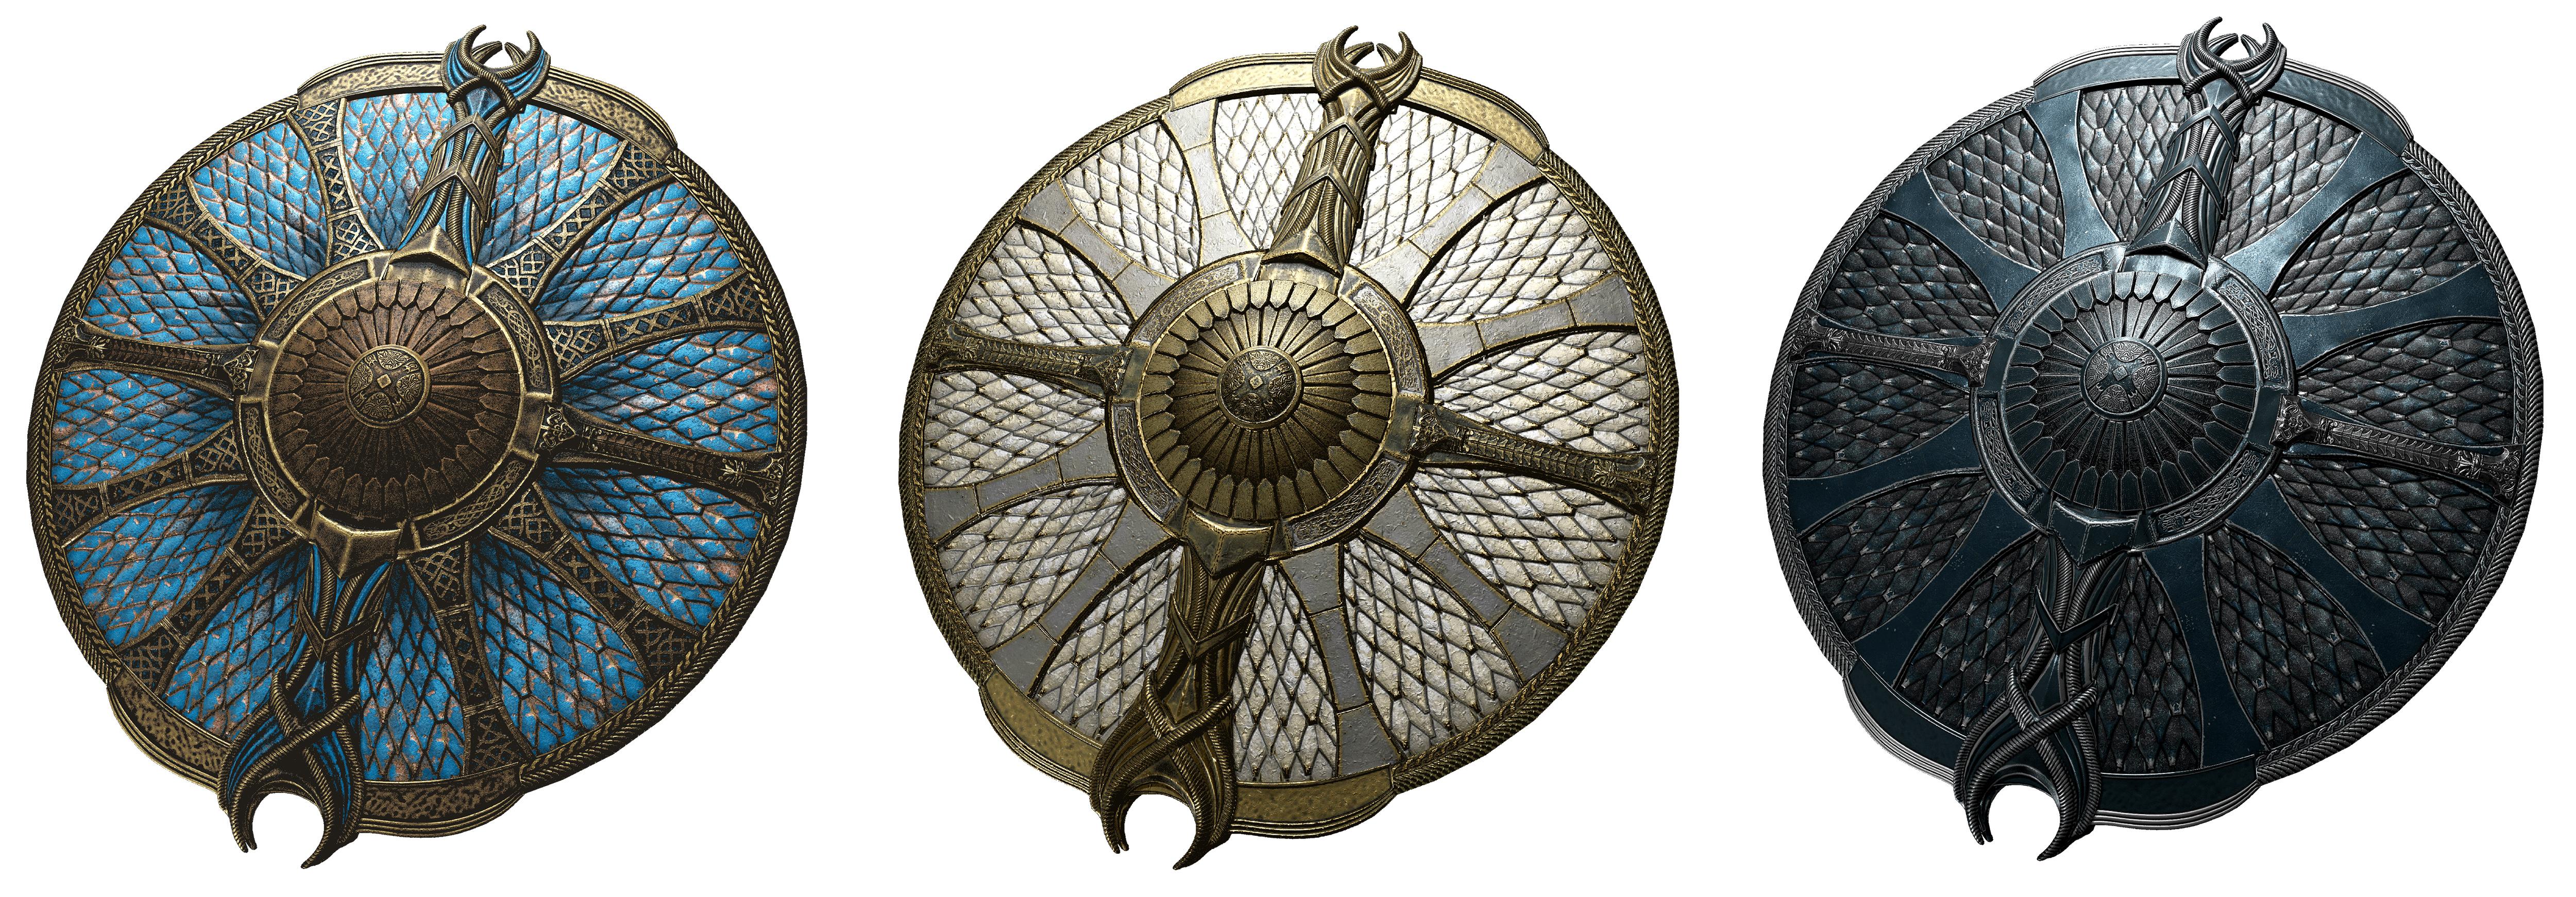 God Of War Shields Legendary Skins